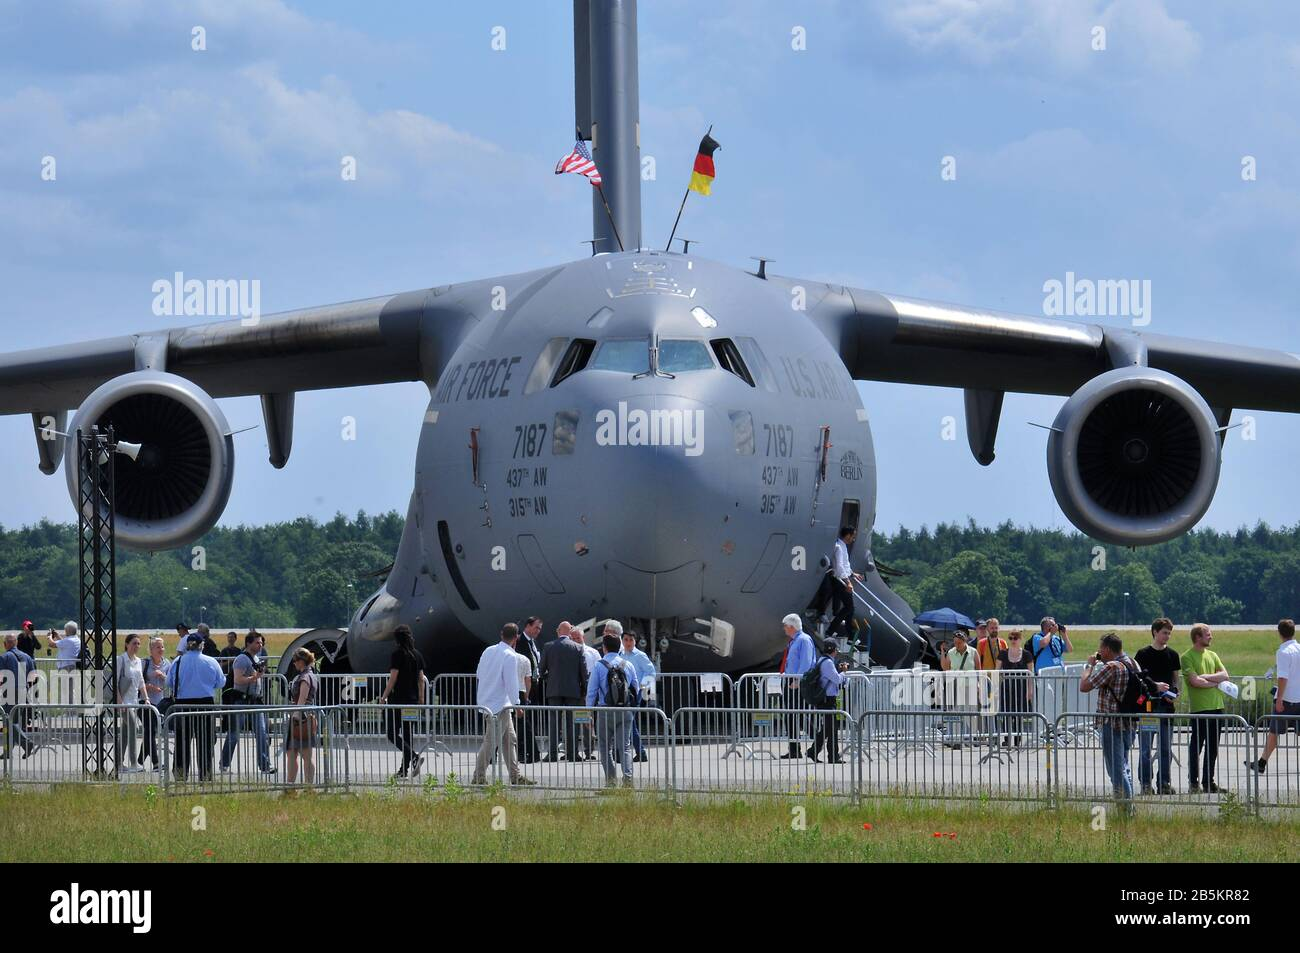 U.S. Air Force, 7187, Boeing C-17A Globemaster III, ILA, Berlin-Schoenefeld, Deutschland Stock Photo